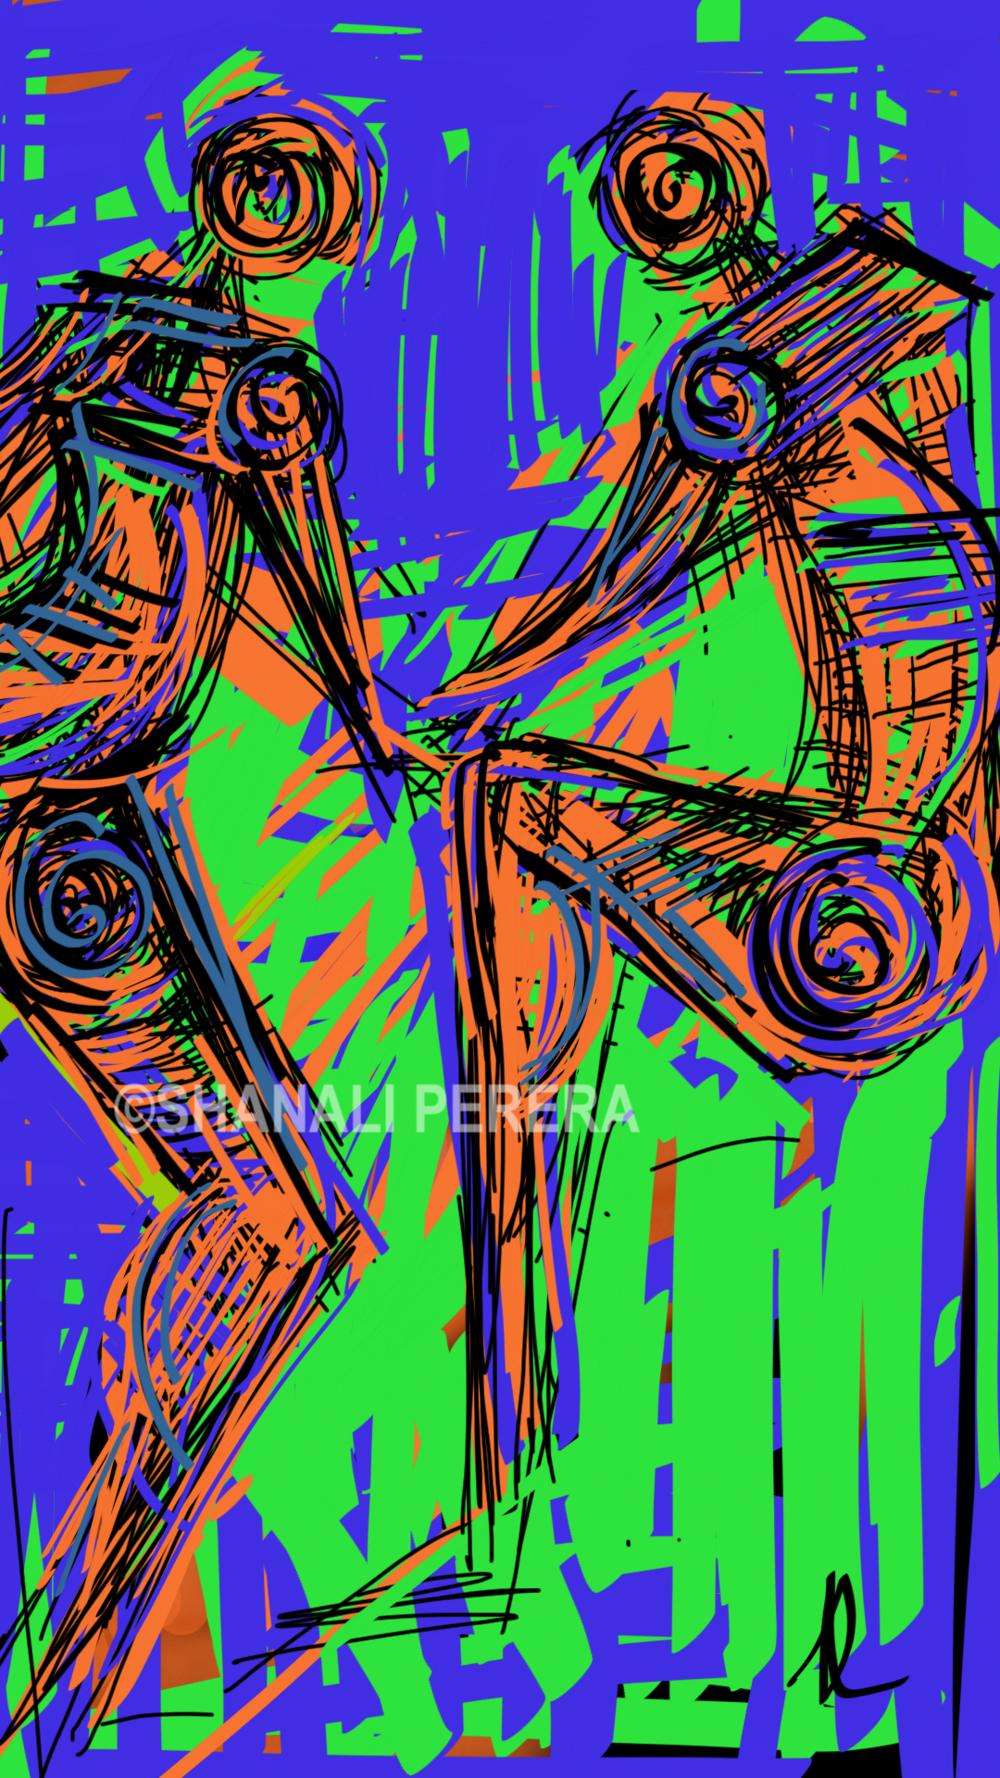 sketch-1516513885722.png